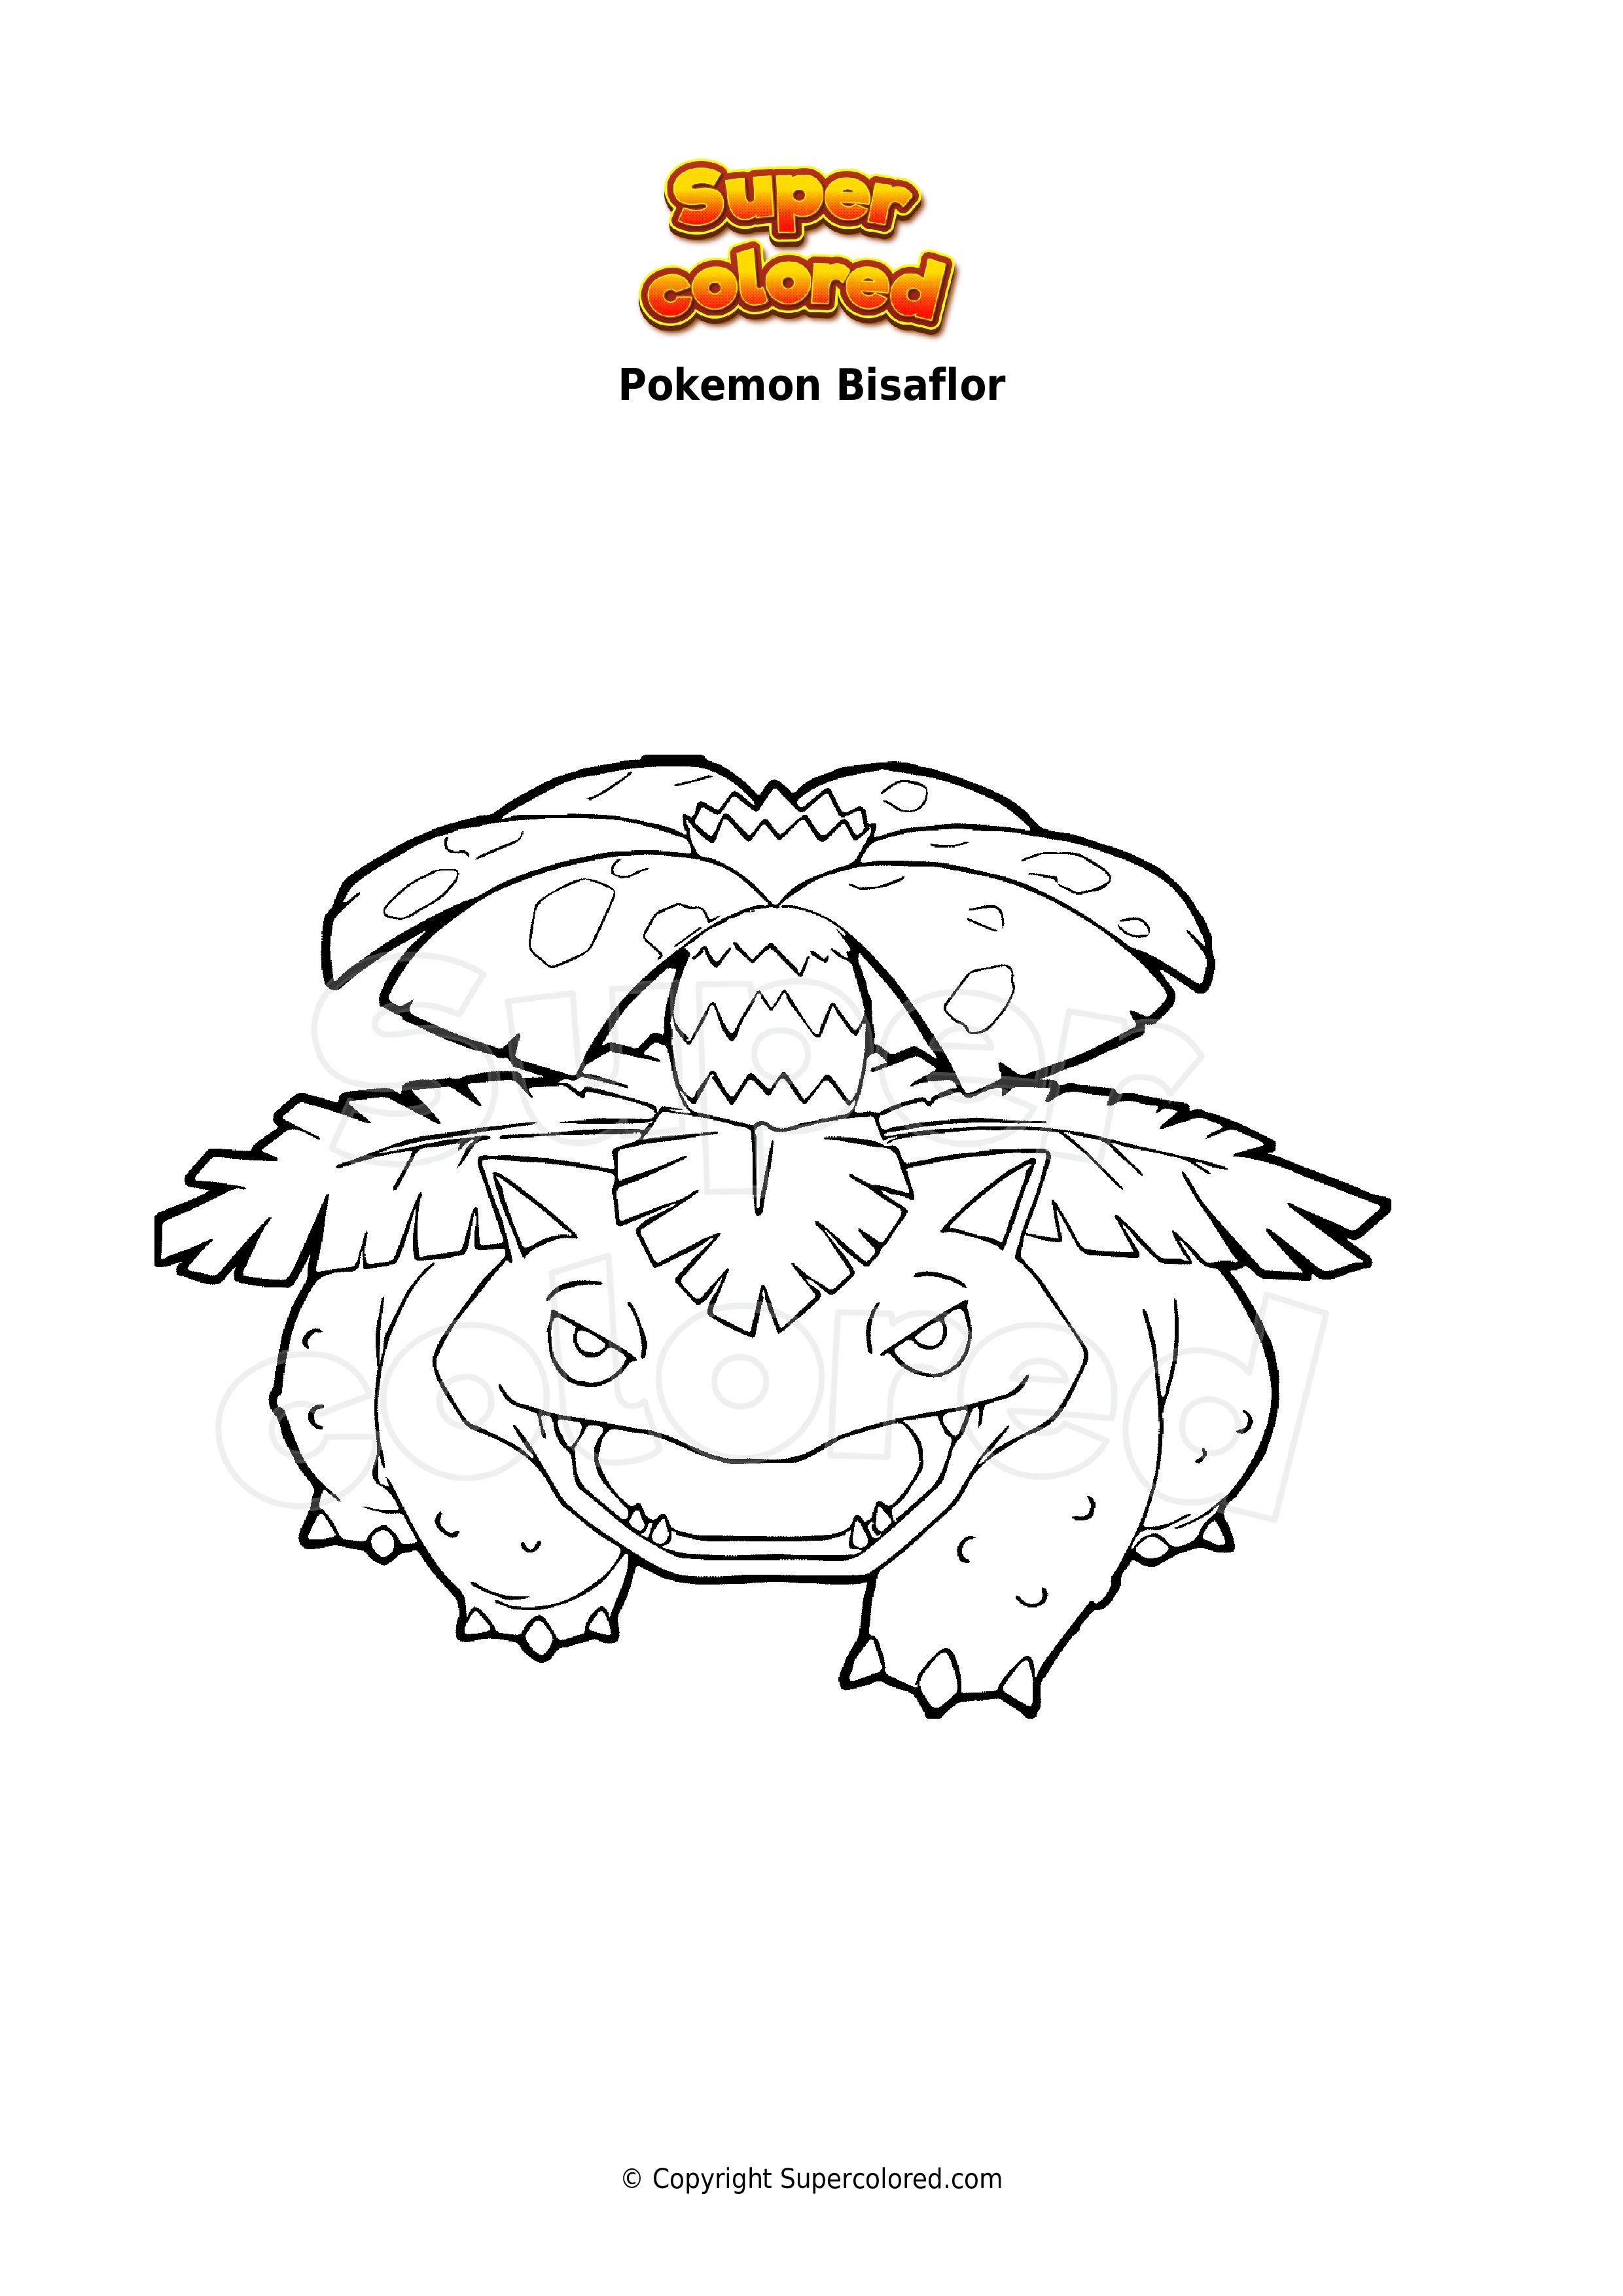 Ausmalbild Pokemon Bisaflor - Supercolored.com